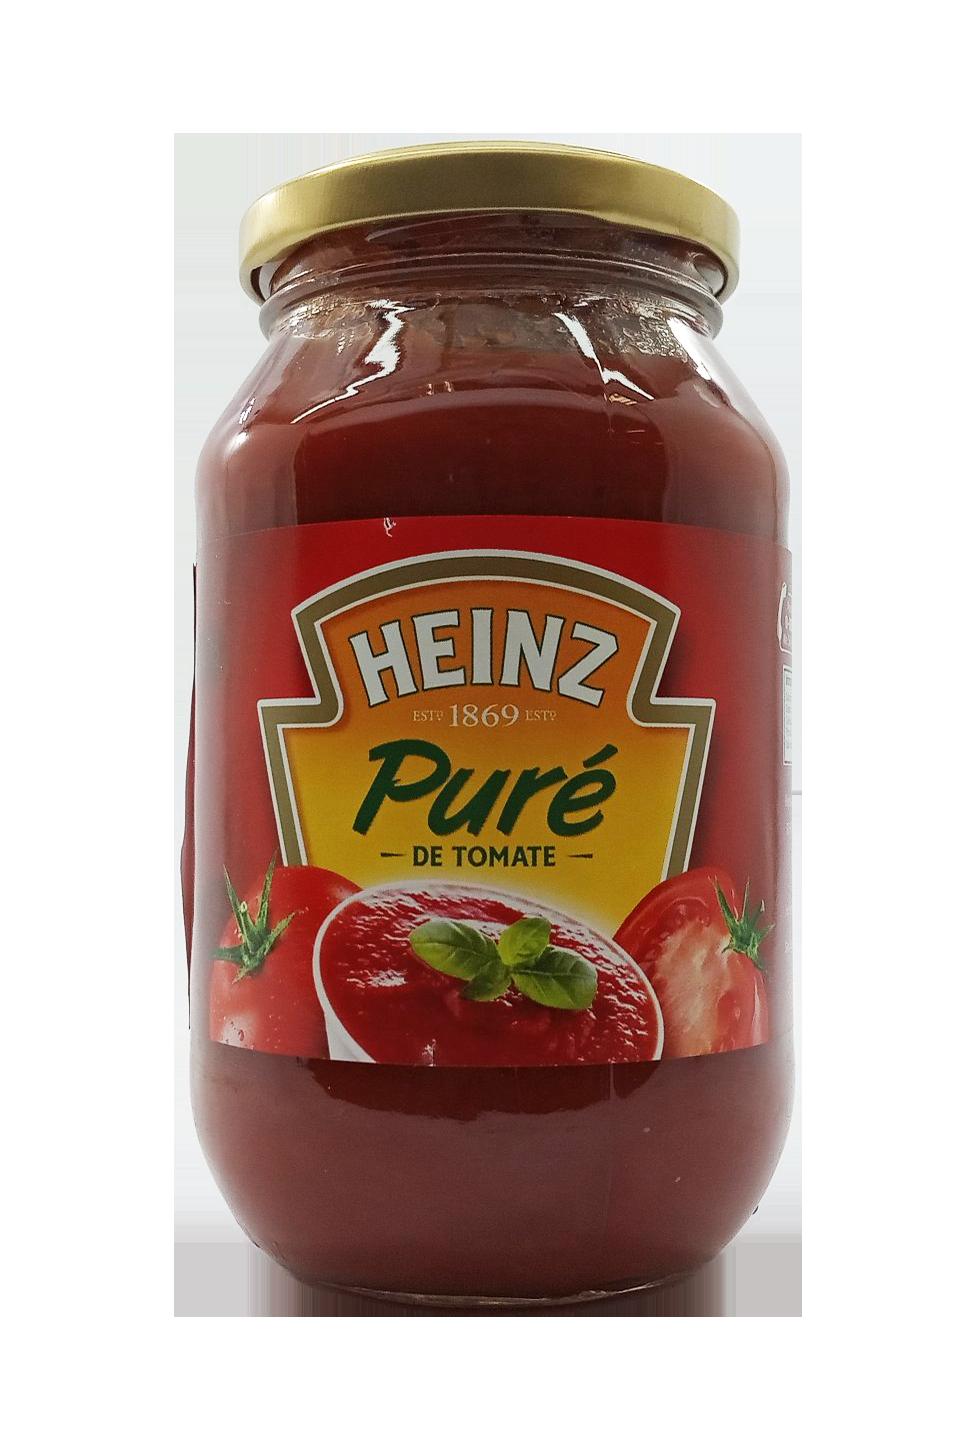 HEINZ PURE DE TOMATE 490GR